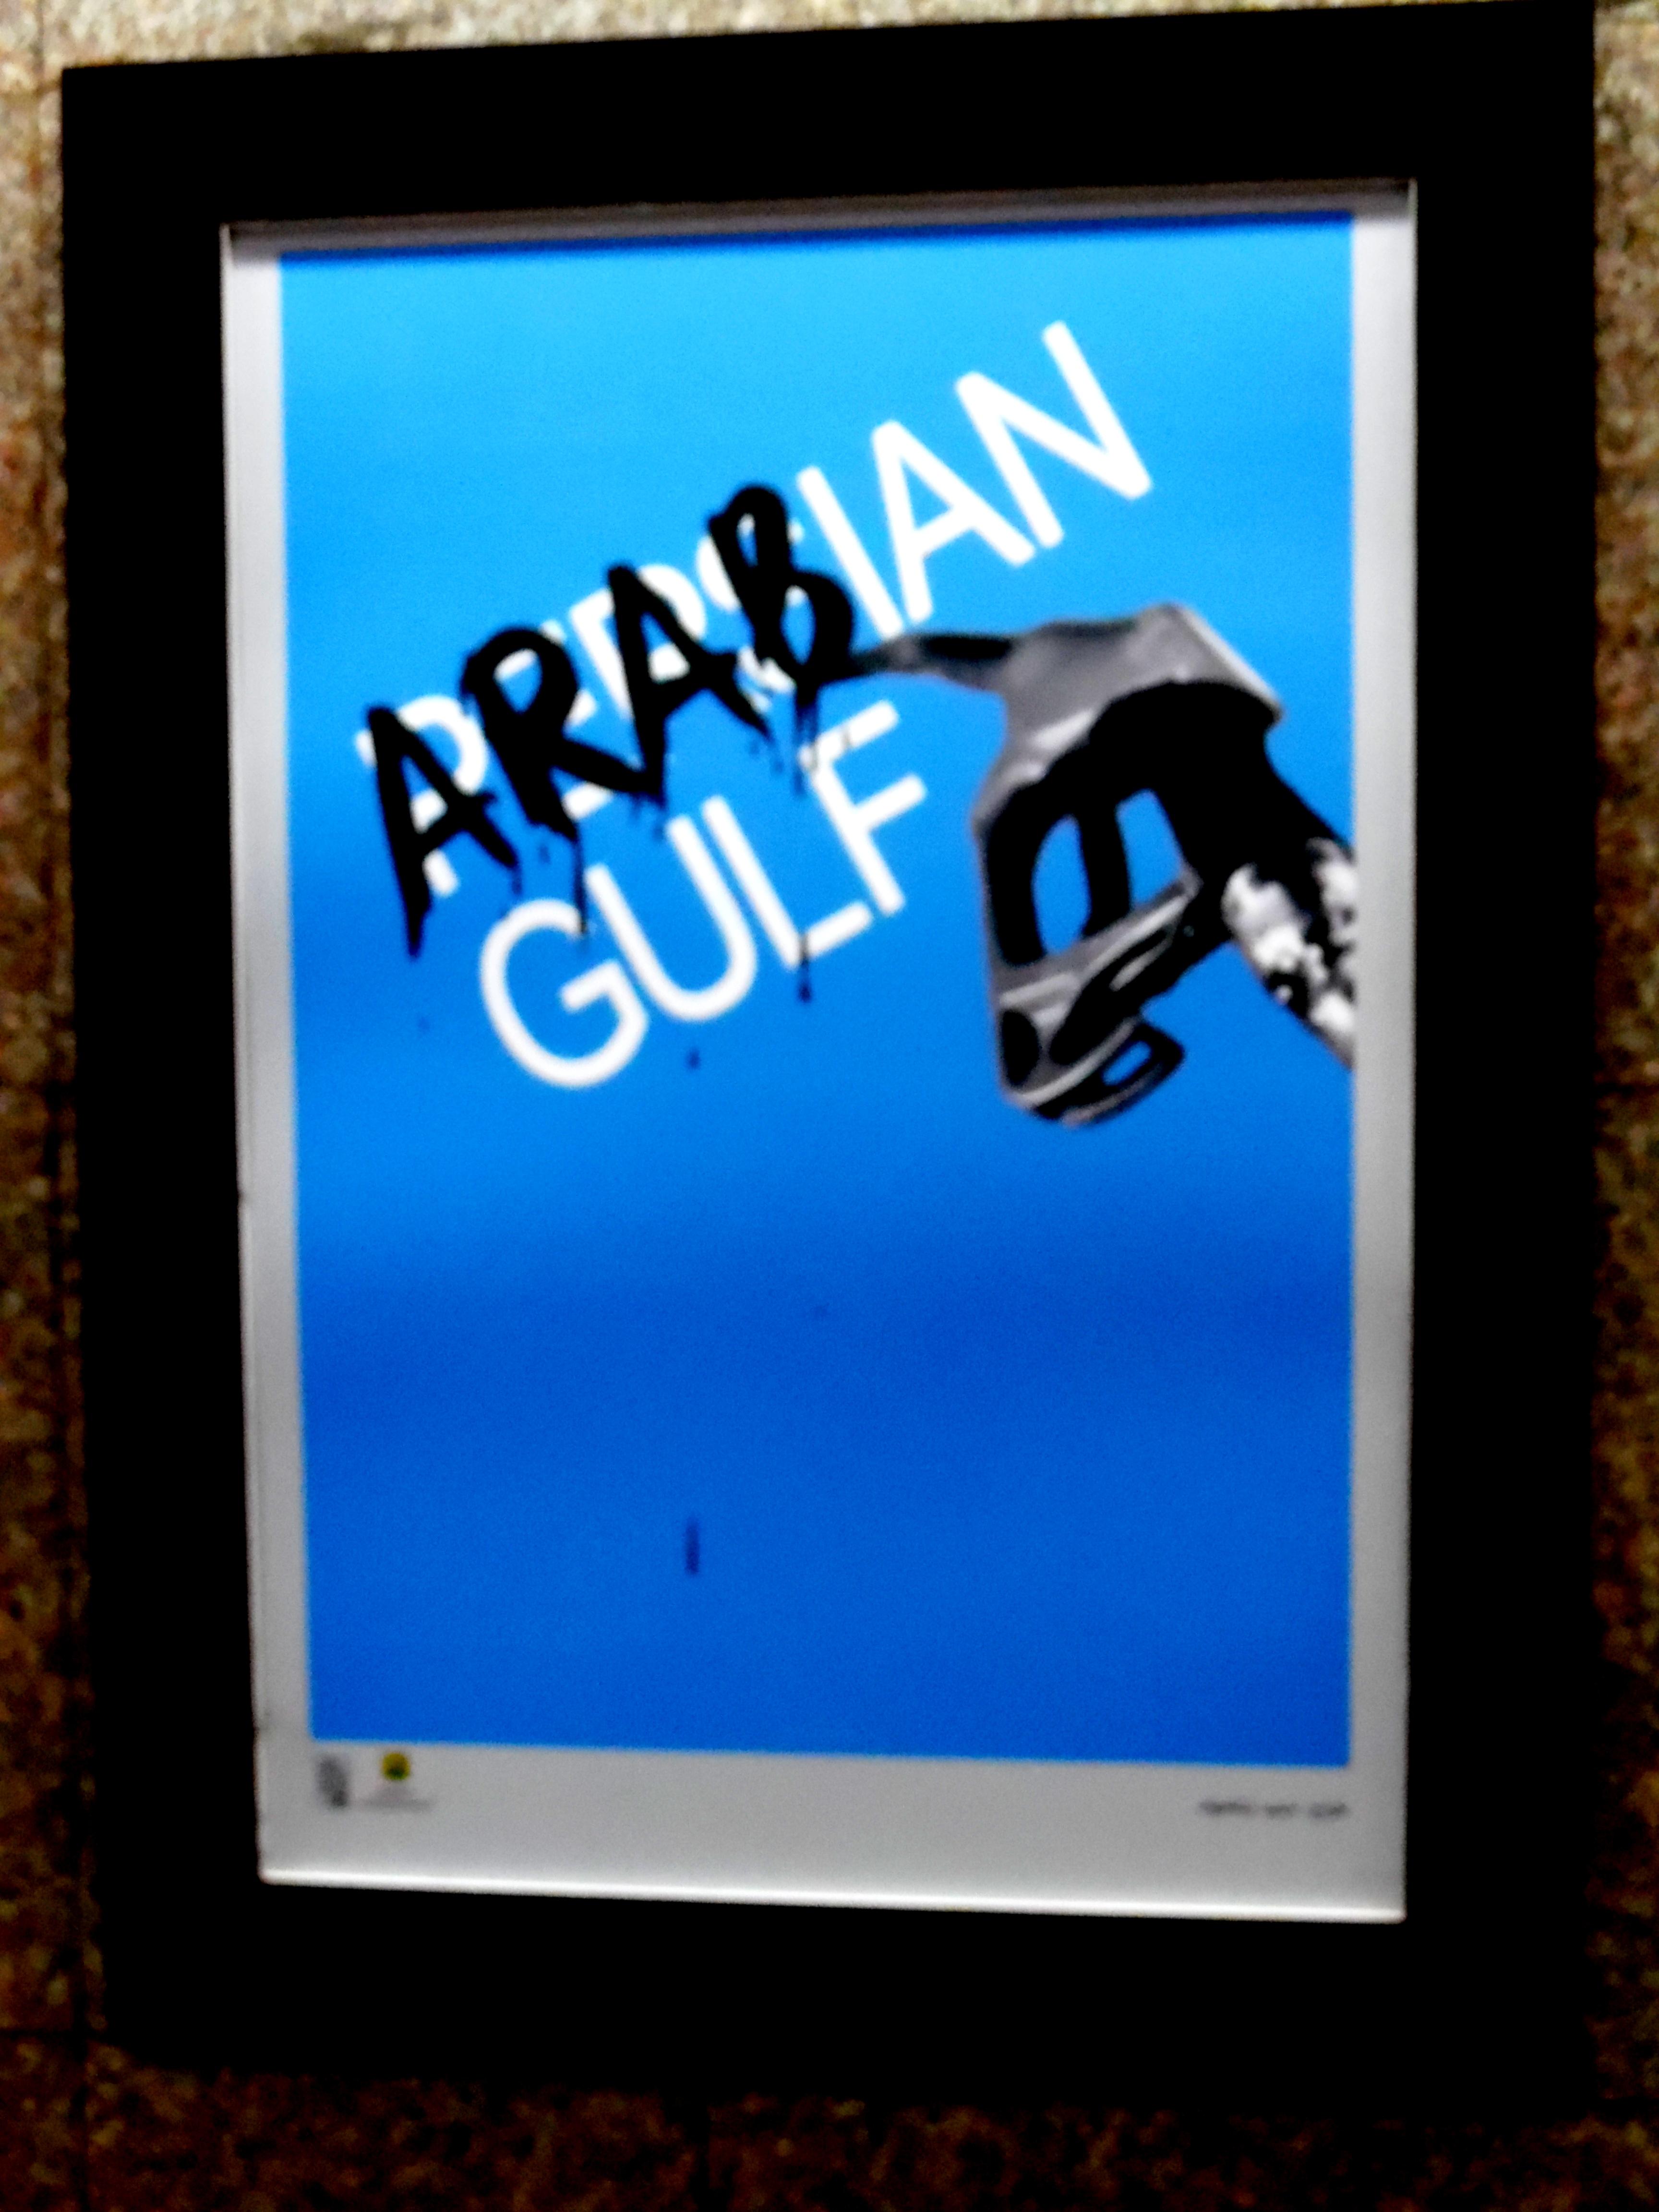 Campagne Golfe persique